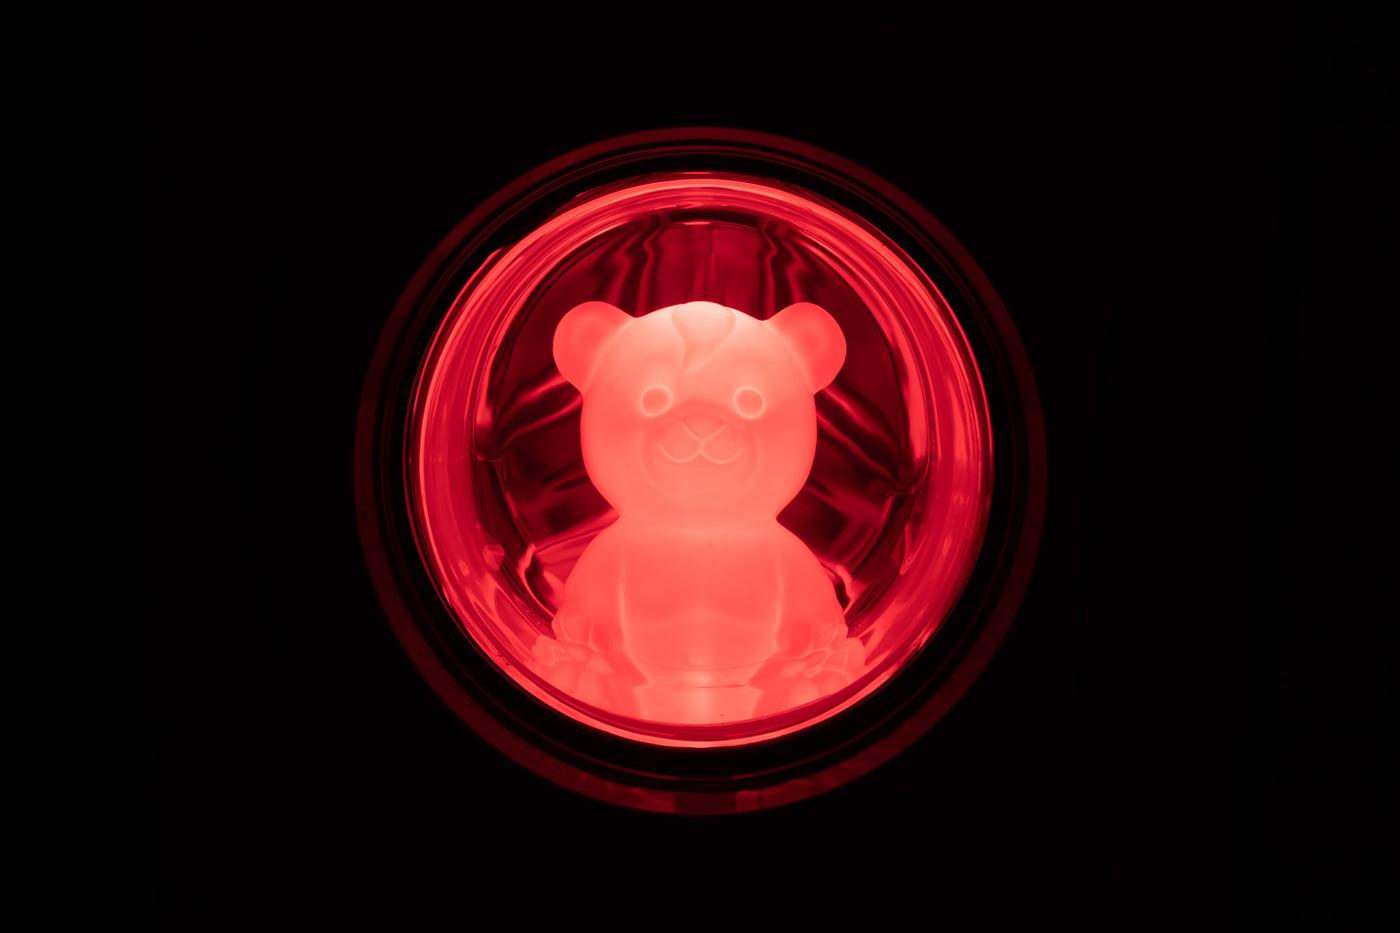 night bear toy Lamp red black longexposure